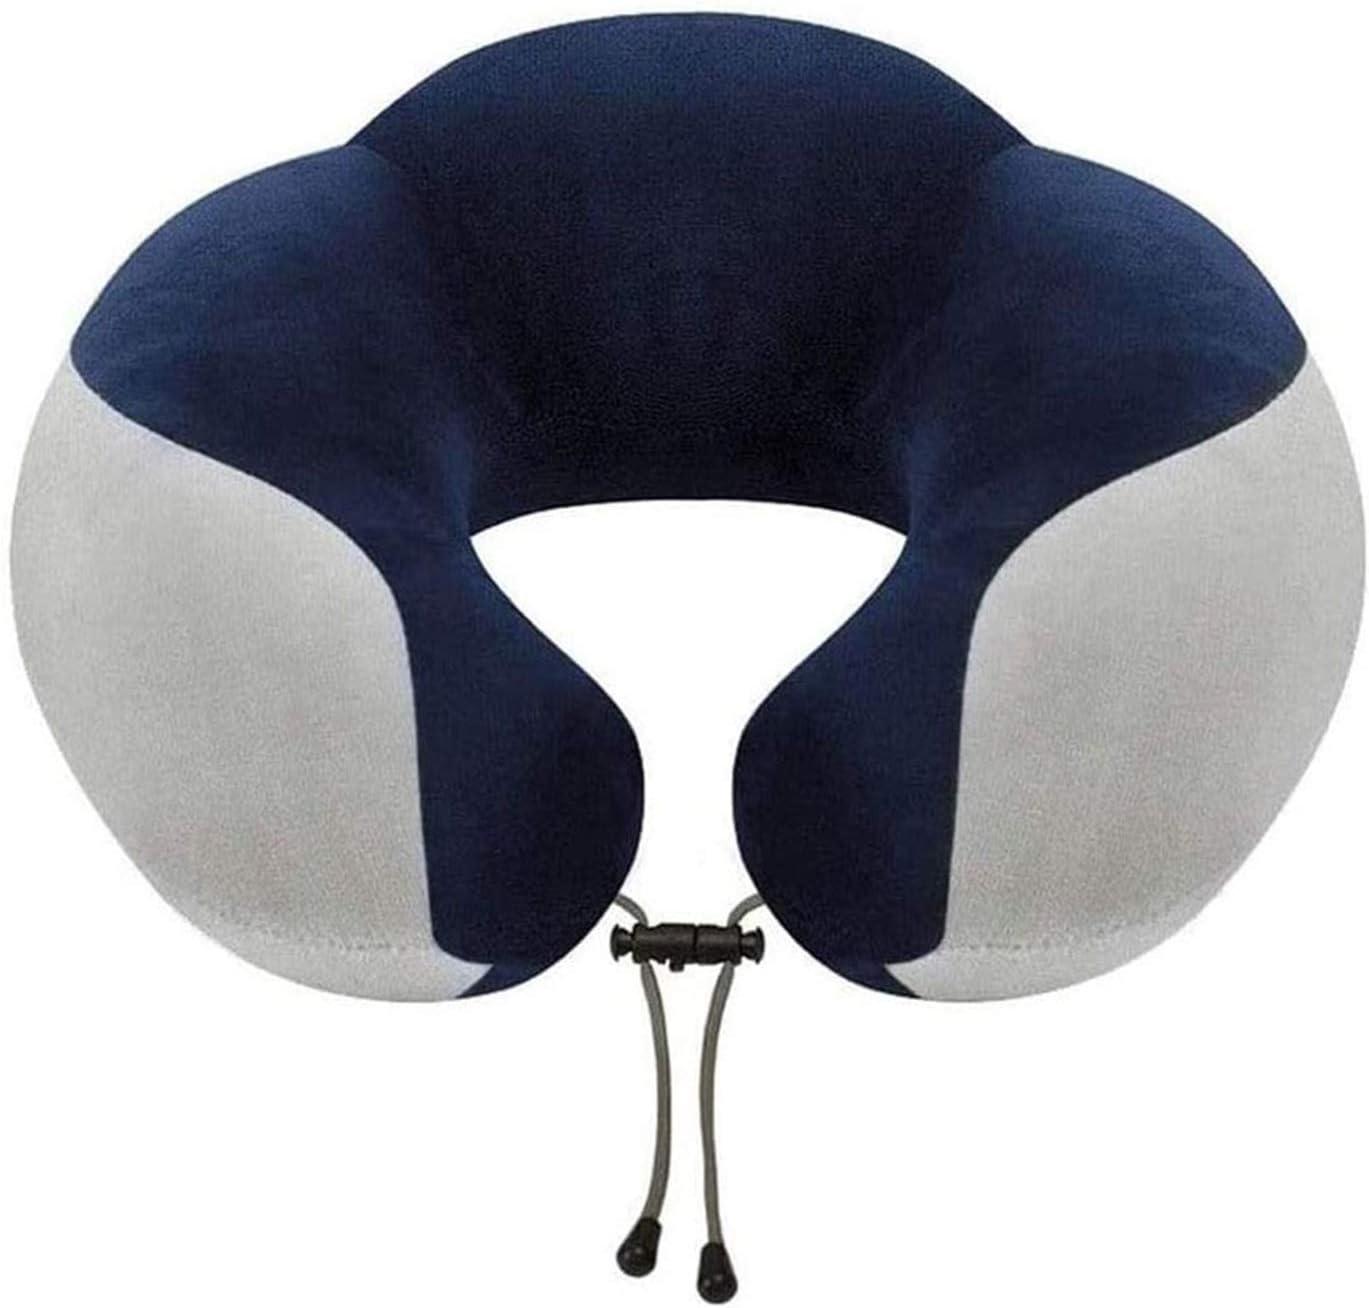 HKJZ Regular discount SFLRW Memory Foam Travel for Pillow Airplane Arlington Mall –Neck